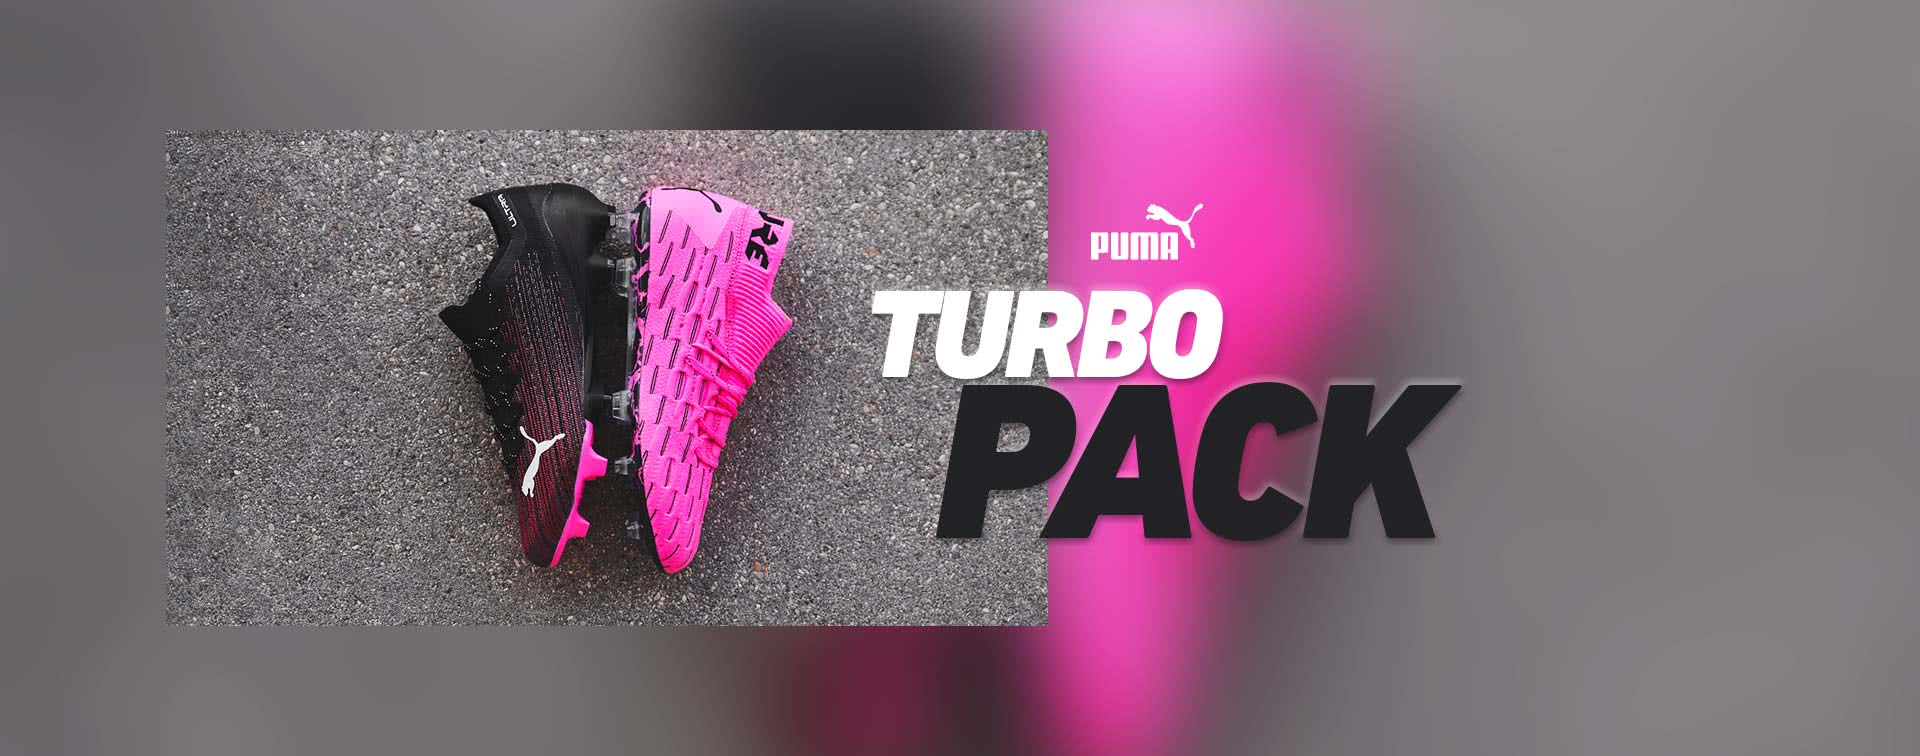 Nouvelles chaussures de football Puma Turbo Pack